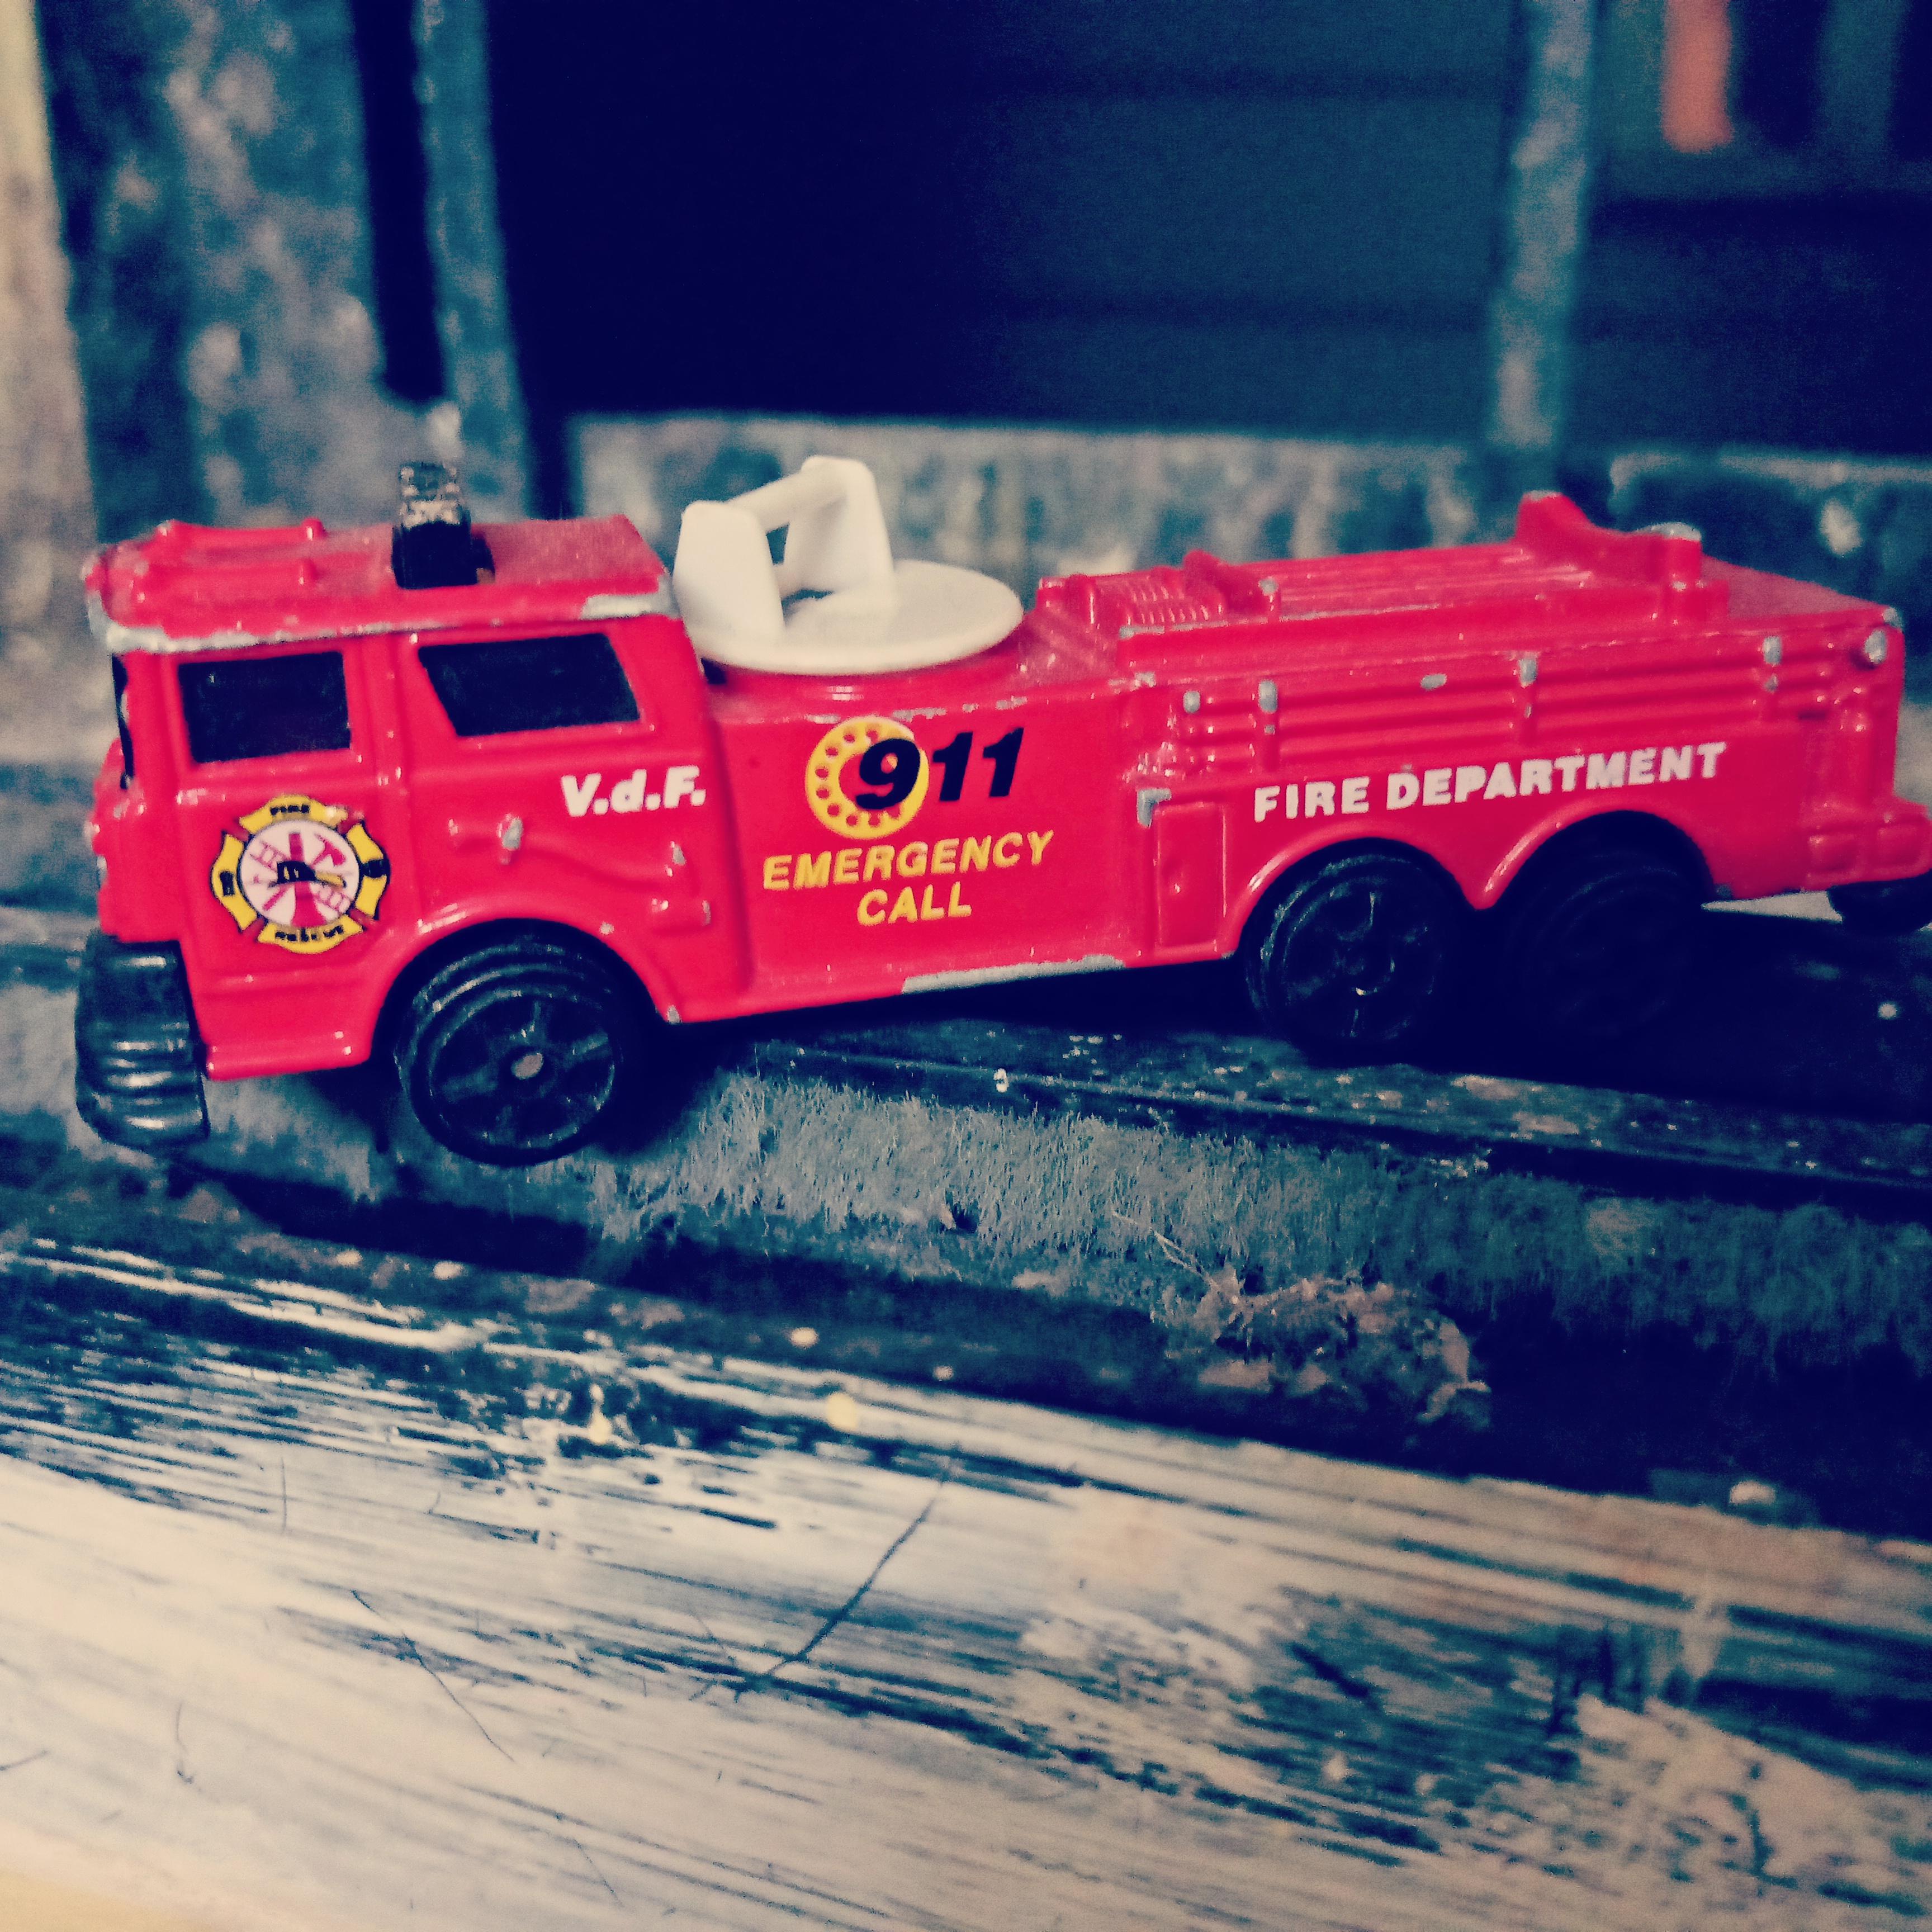 Gambar Pompa Pemadam Kebakaran Mainan Warna Merah Desain Gambar